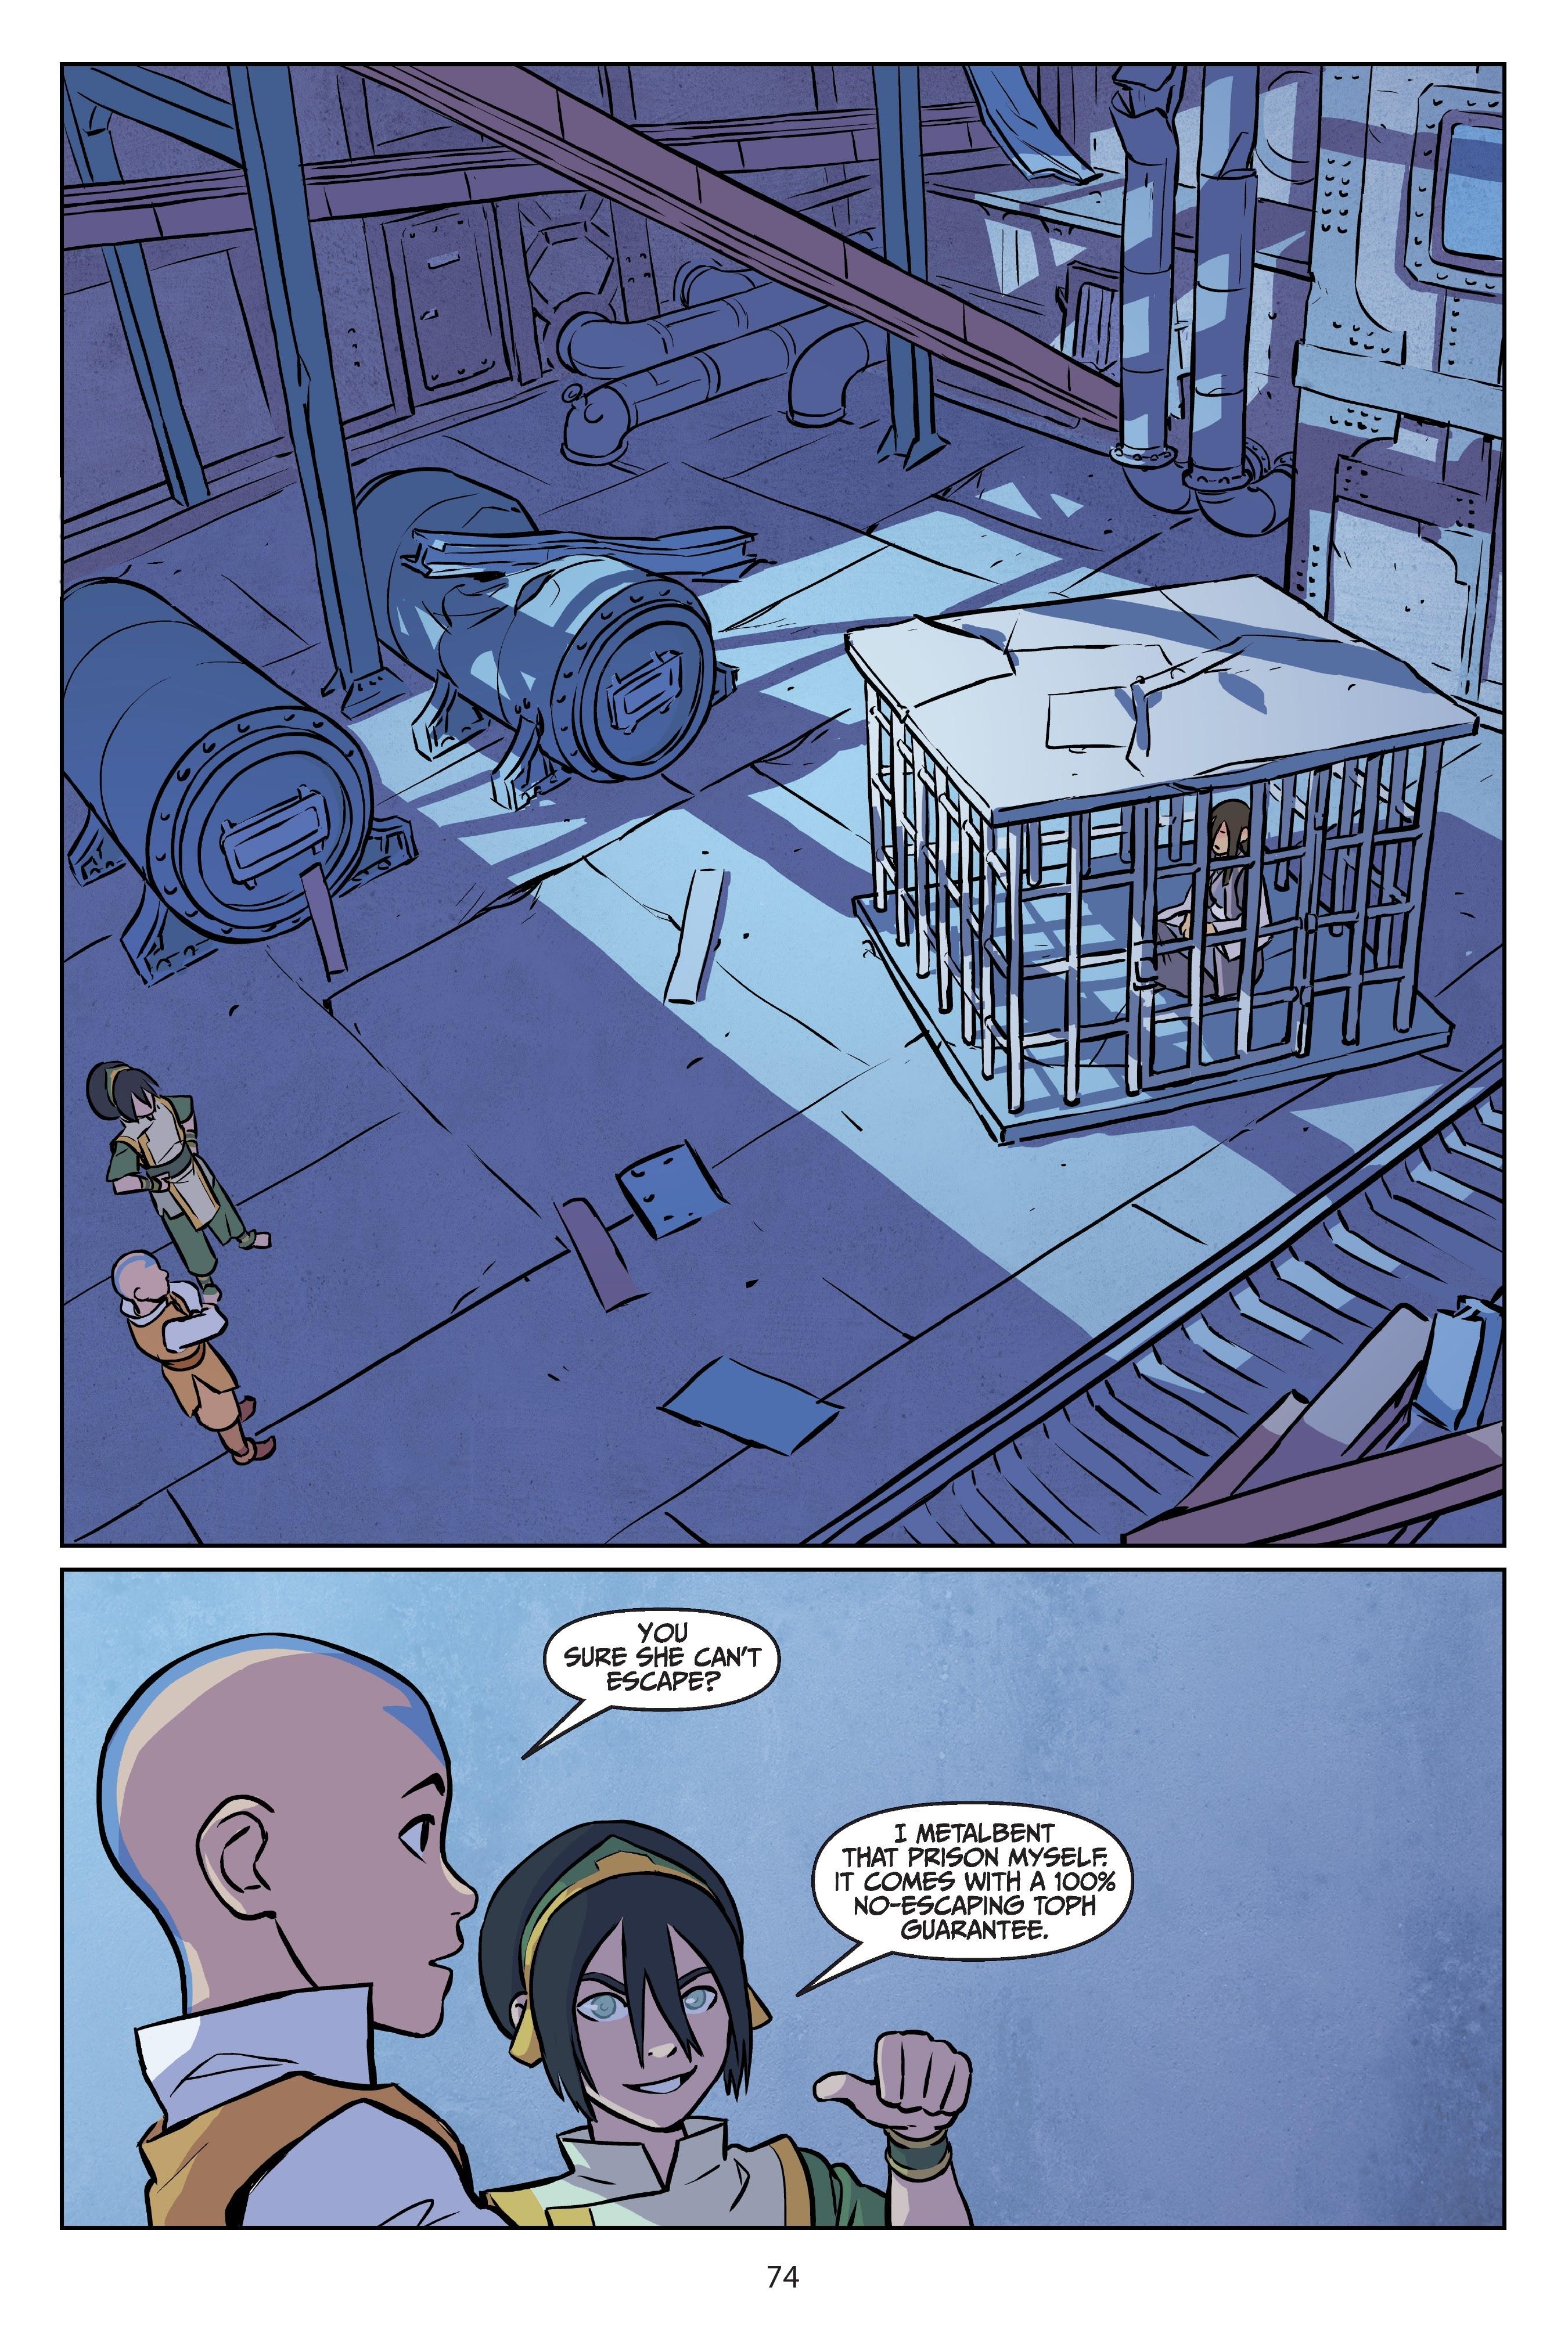 Nickelodeon Avatar: The Last Airbender - Imbalance TPB_2 Page 74